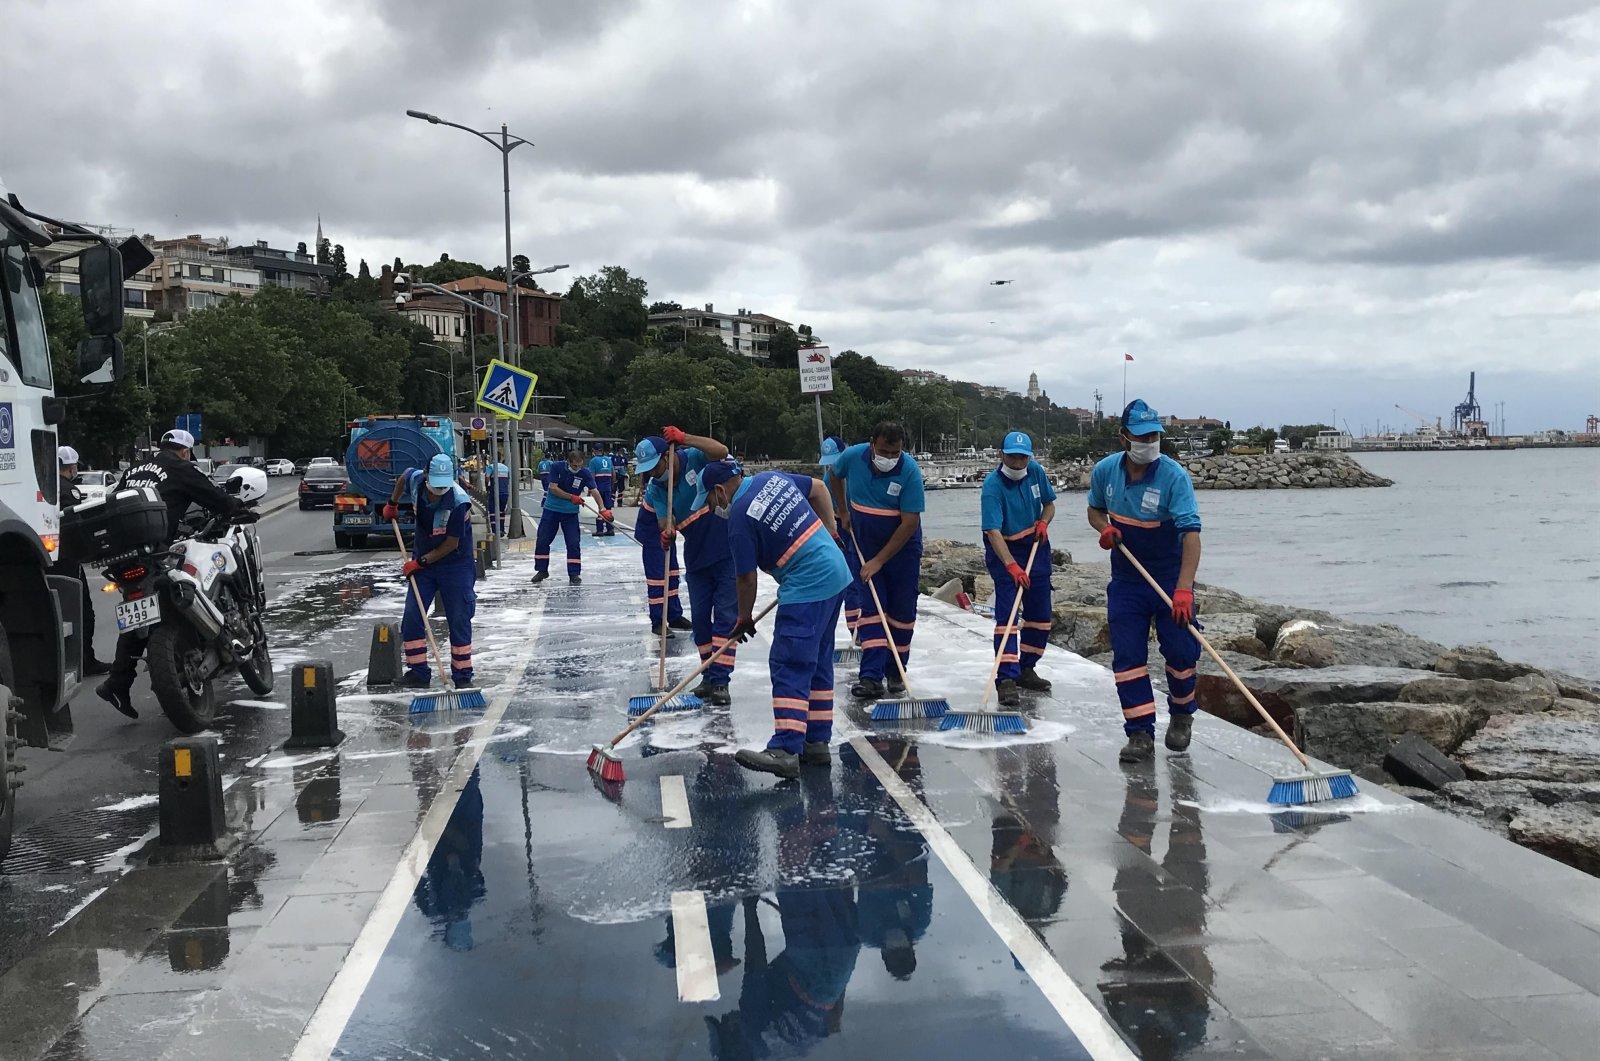 Municipality crews clean up the coast in the Üsküdar district of Istanbul, Turkey, July 8, 2020. (İHA Photo)